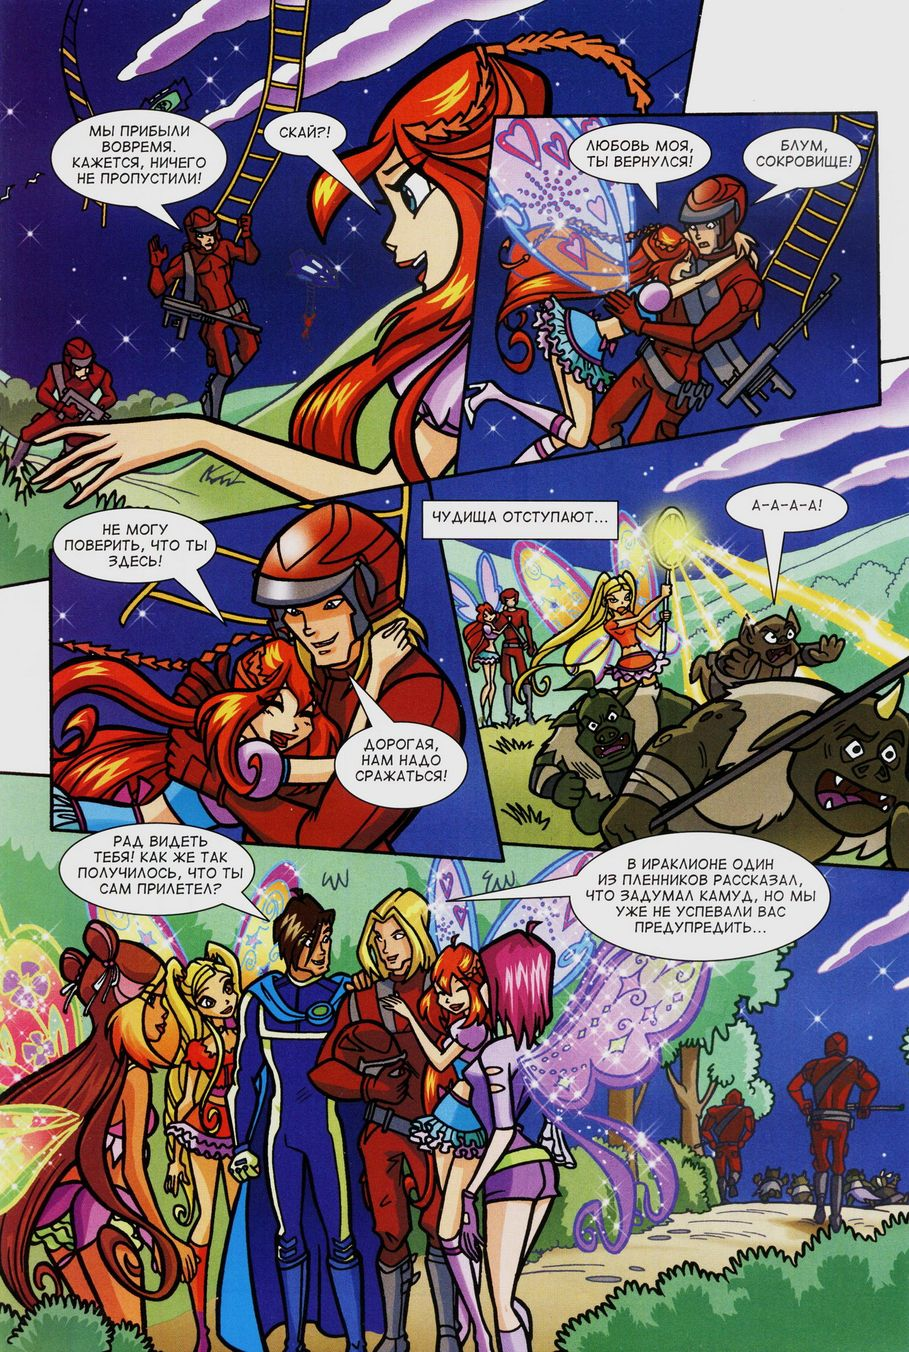 Комикс Винкс Winx - Волшебник Камуд (Журнал Винкс №6 2011) - стр. 58